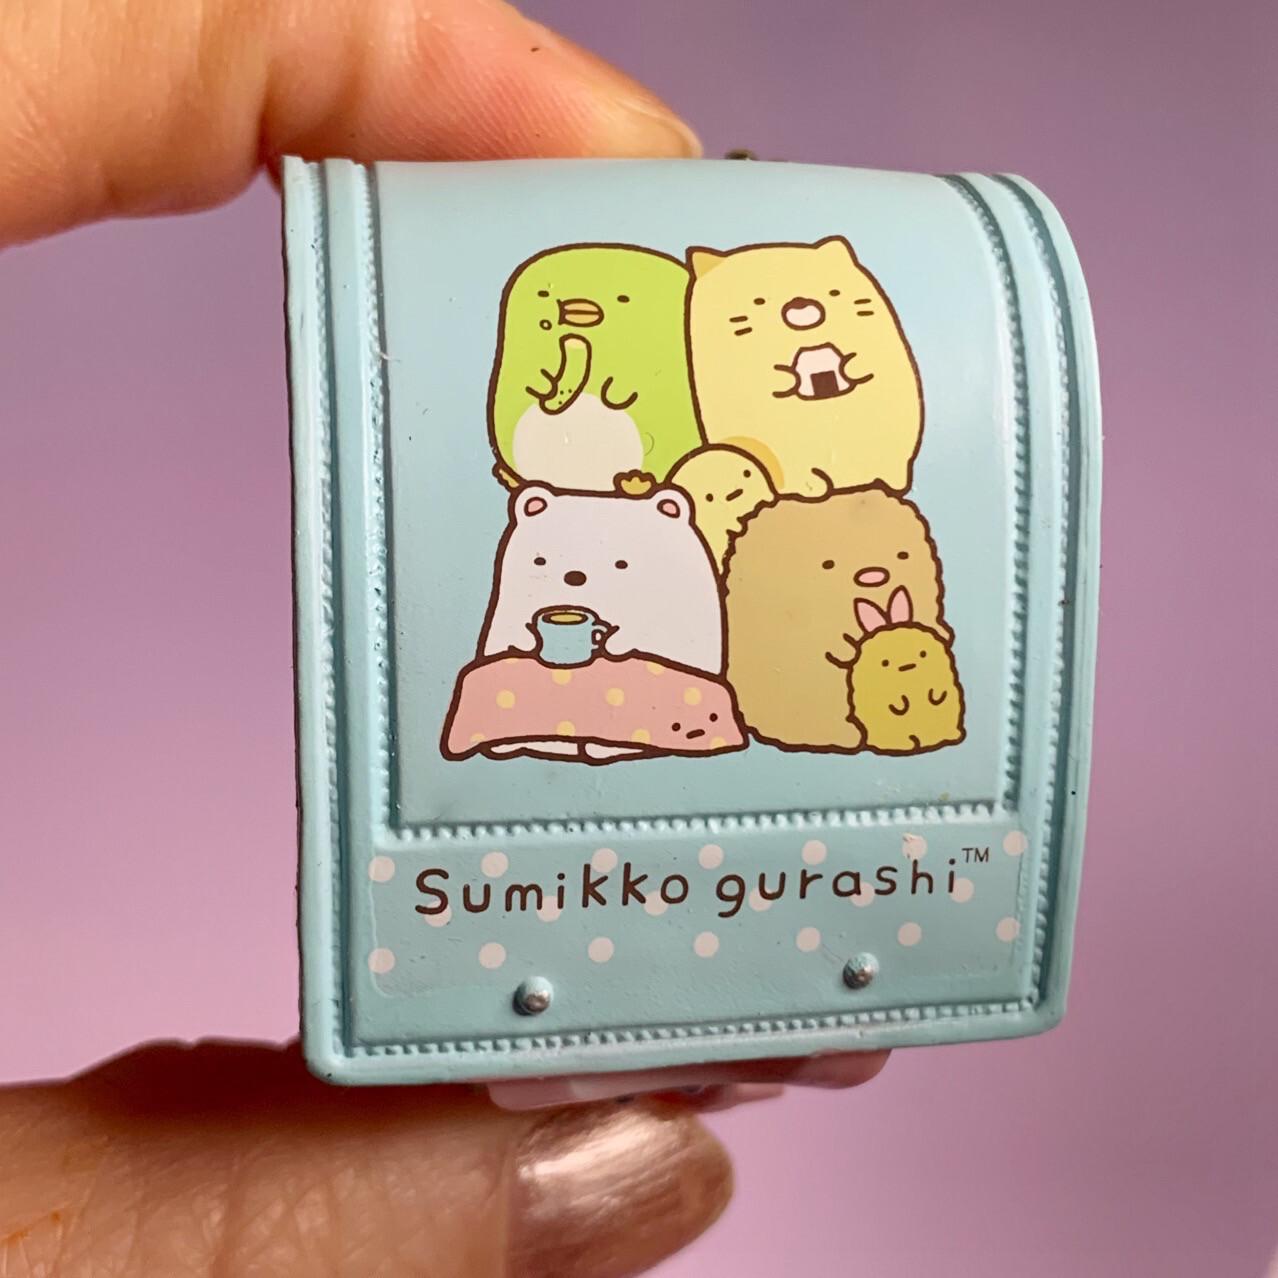 Re-ment Sumikko Gurashi Backpack Keychain